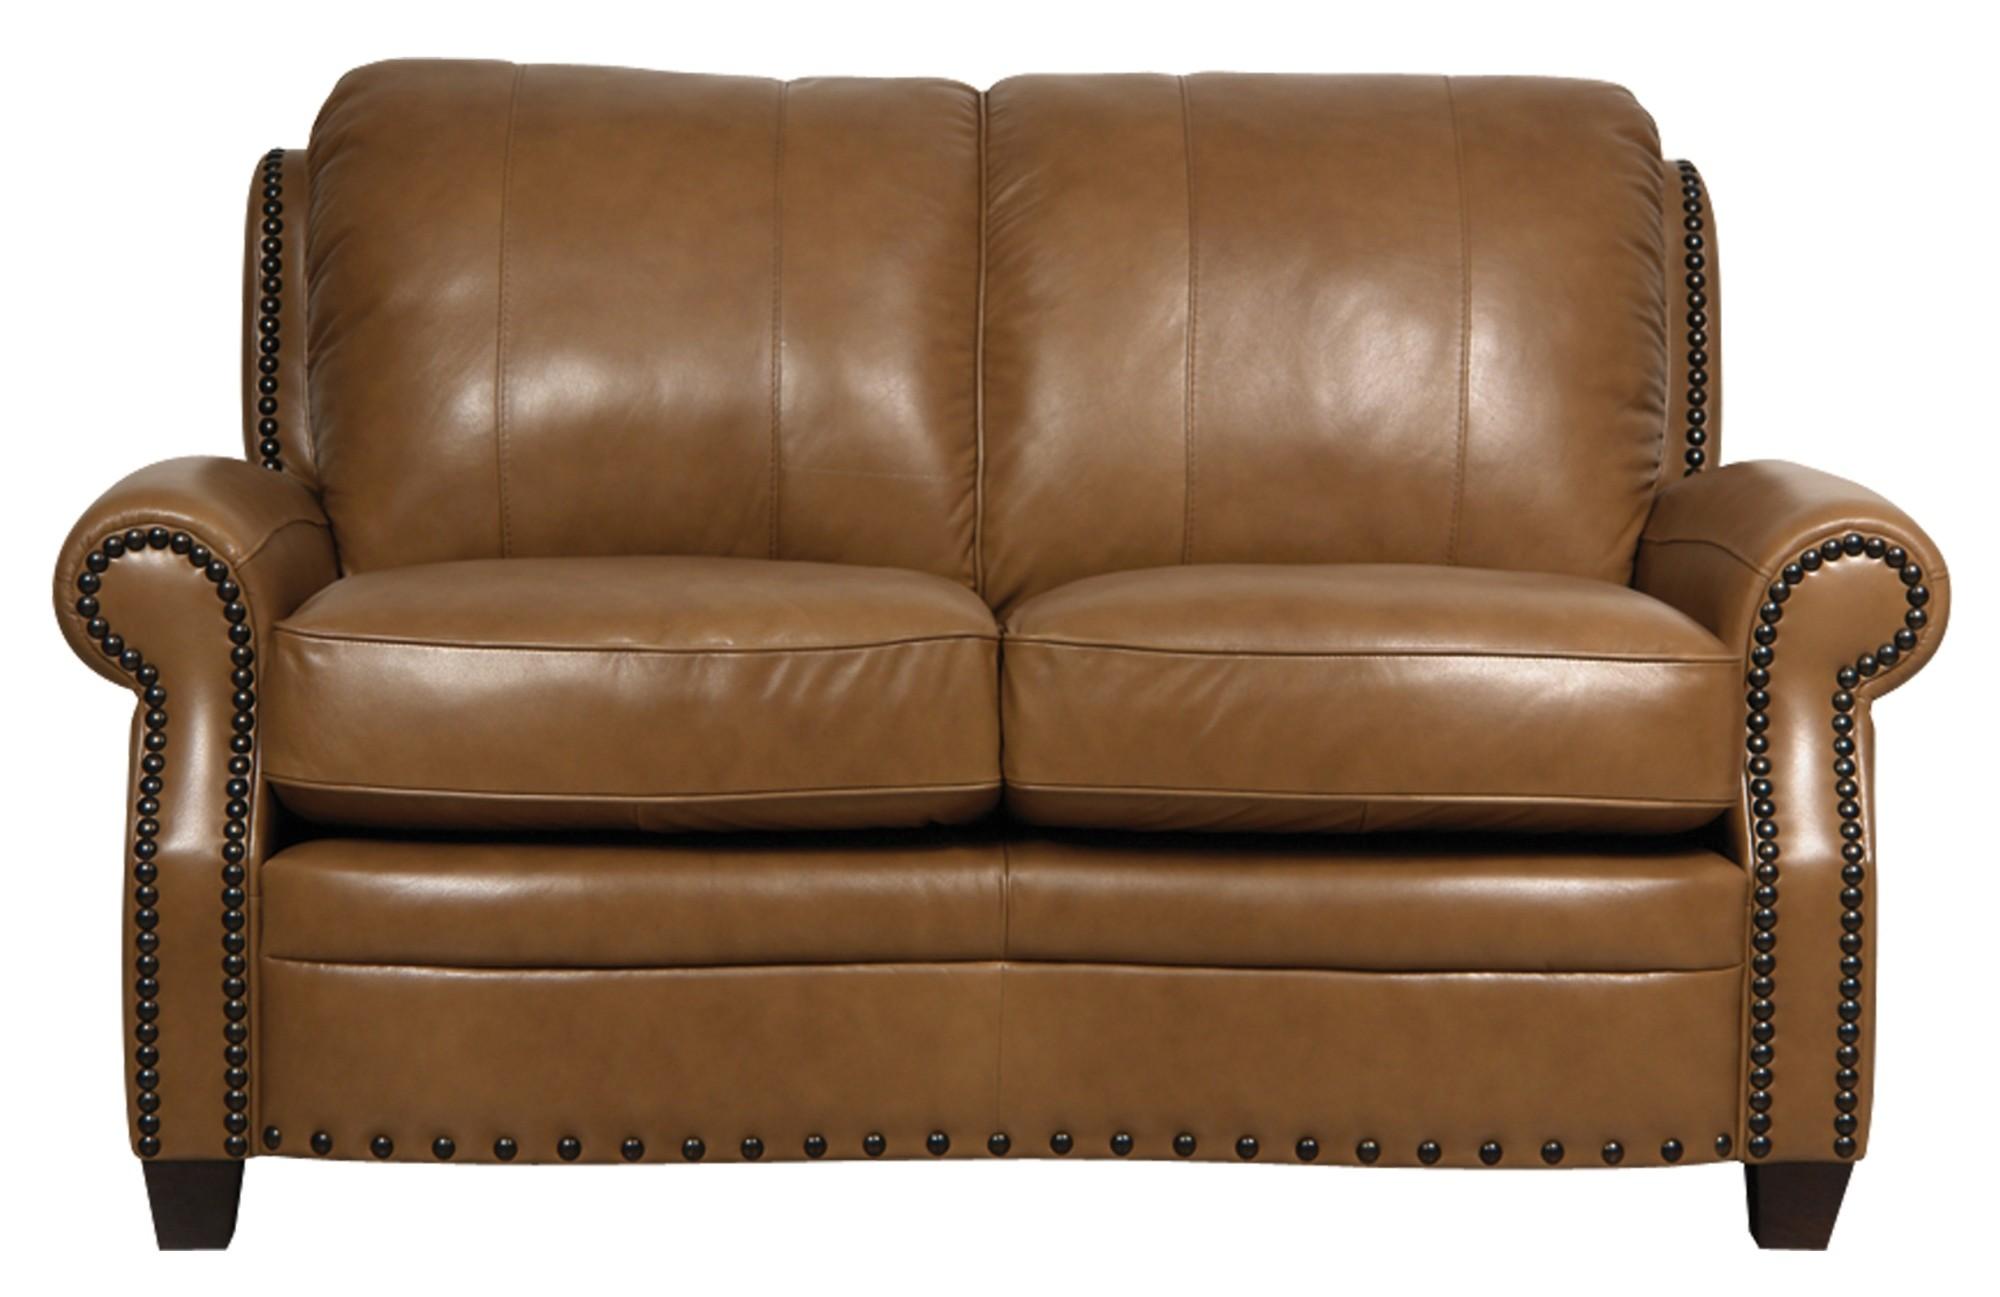 bennett italian leather living room set from luke leather bennett coleman furniture. Black Bedroom Furniture Sets. Home Design Ideas